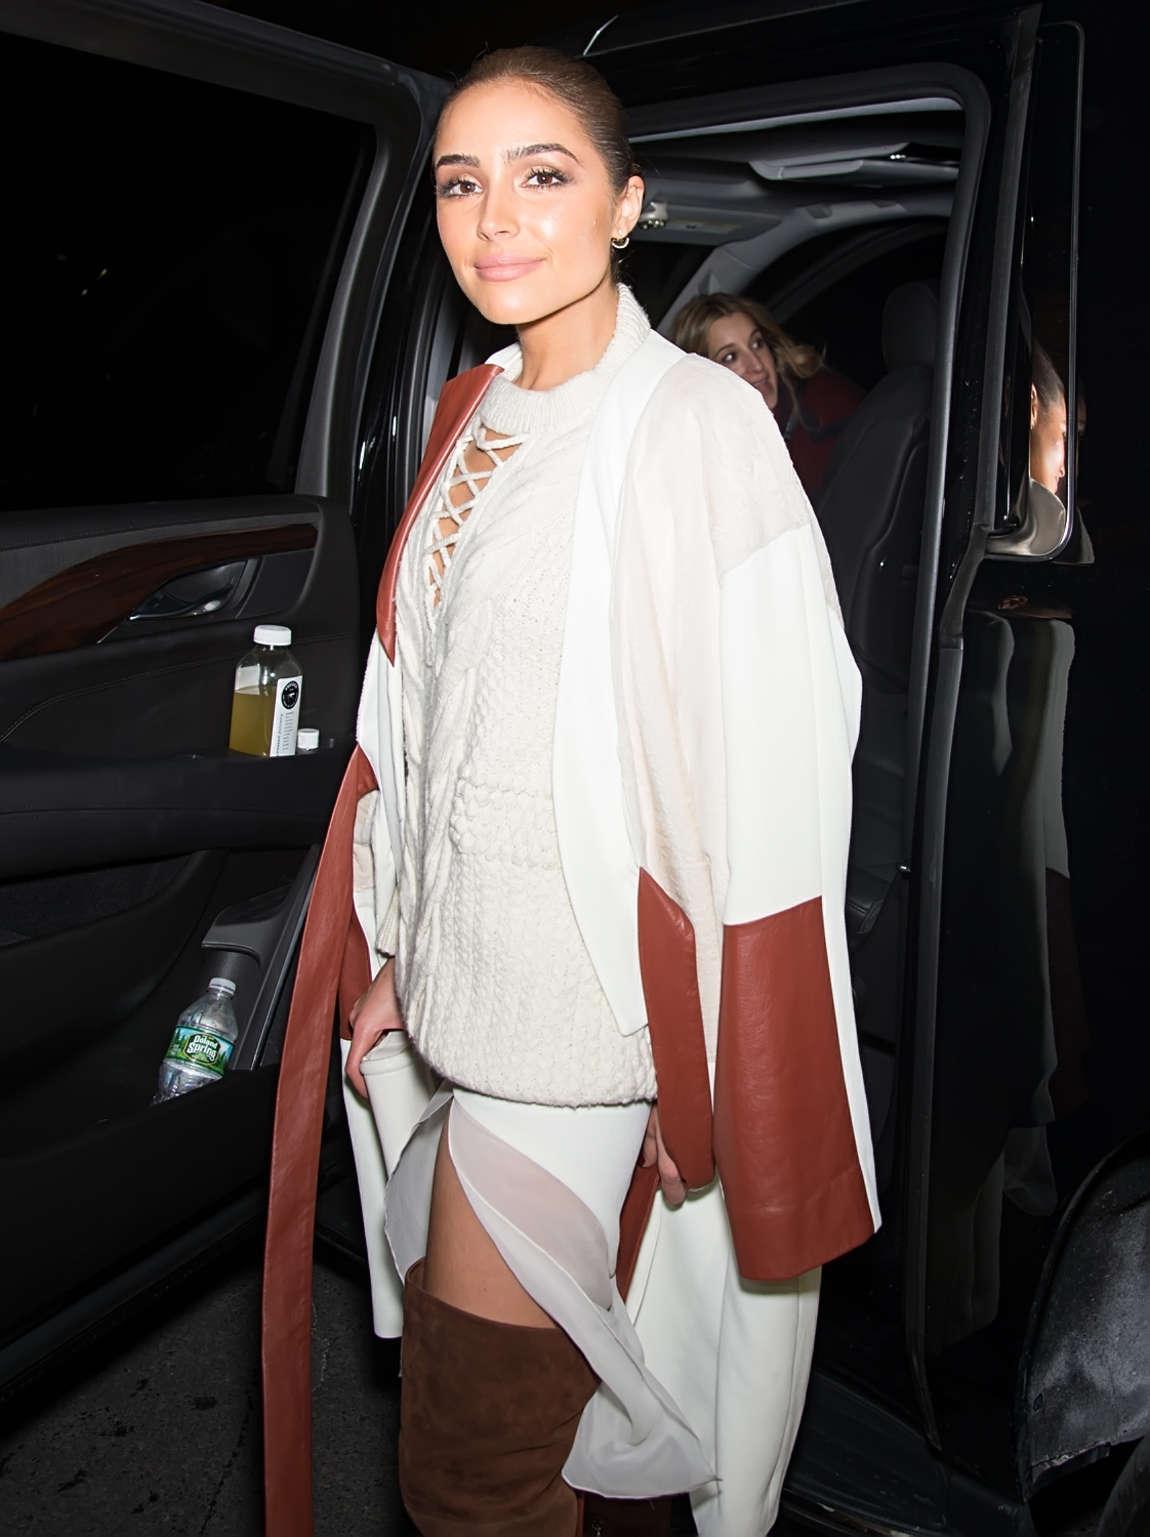 Olivia Culpo 2016 : Olivia Culpo: Leaving Prabal Gurung 2016 Fashion Show -05